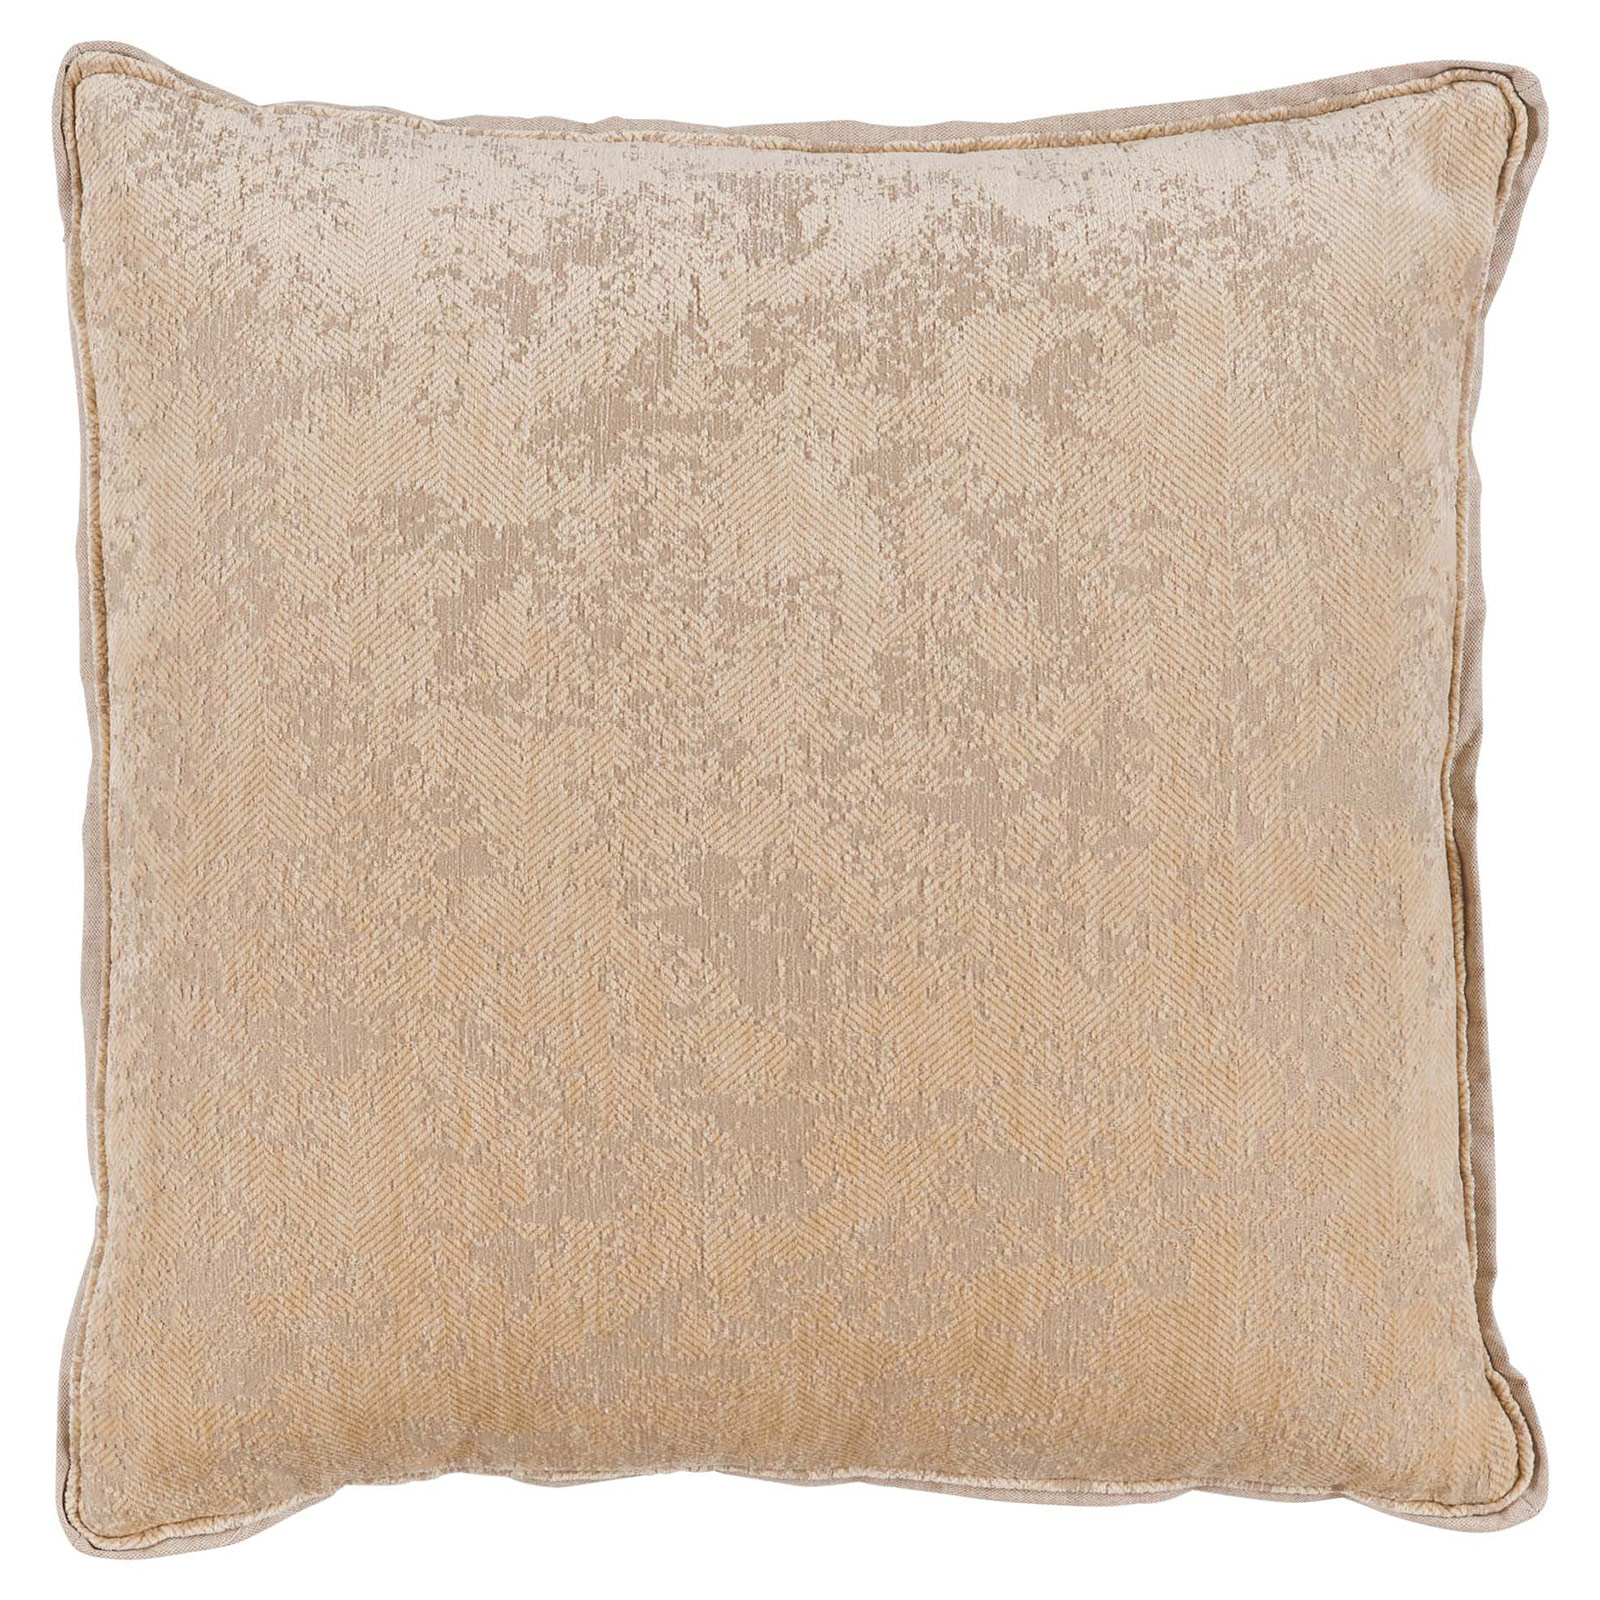 Harriet Regency Washed Herringbone Beige Pillow - 22x22